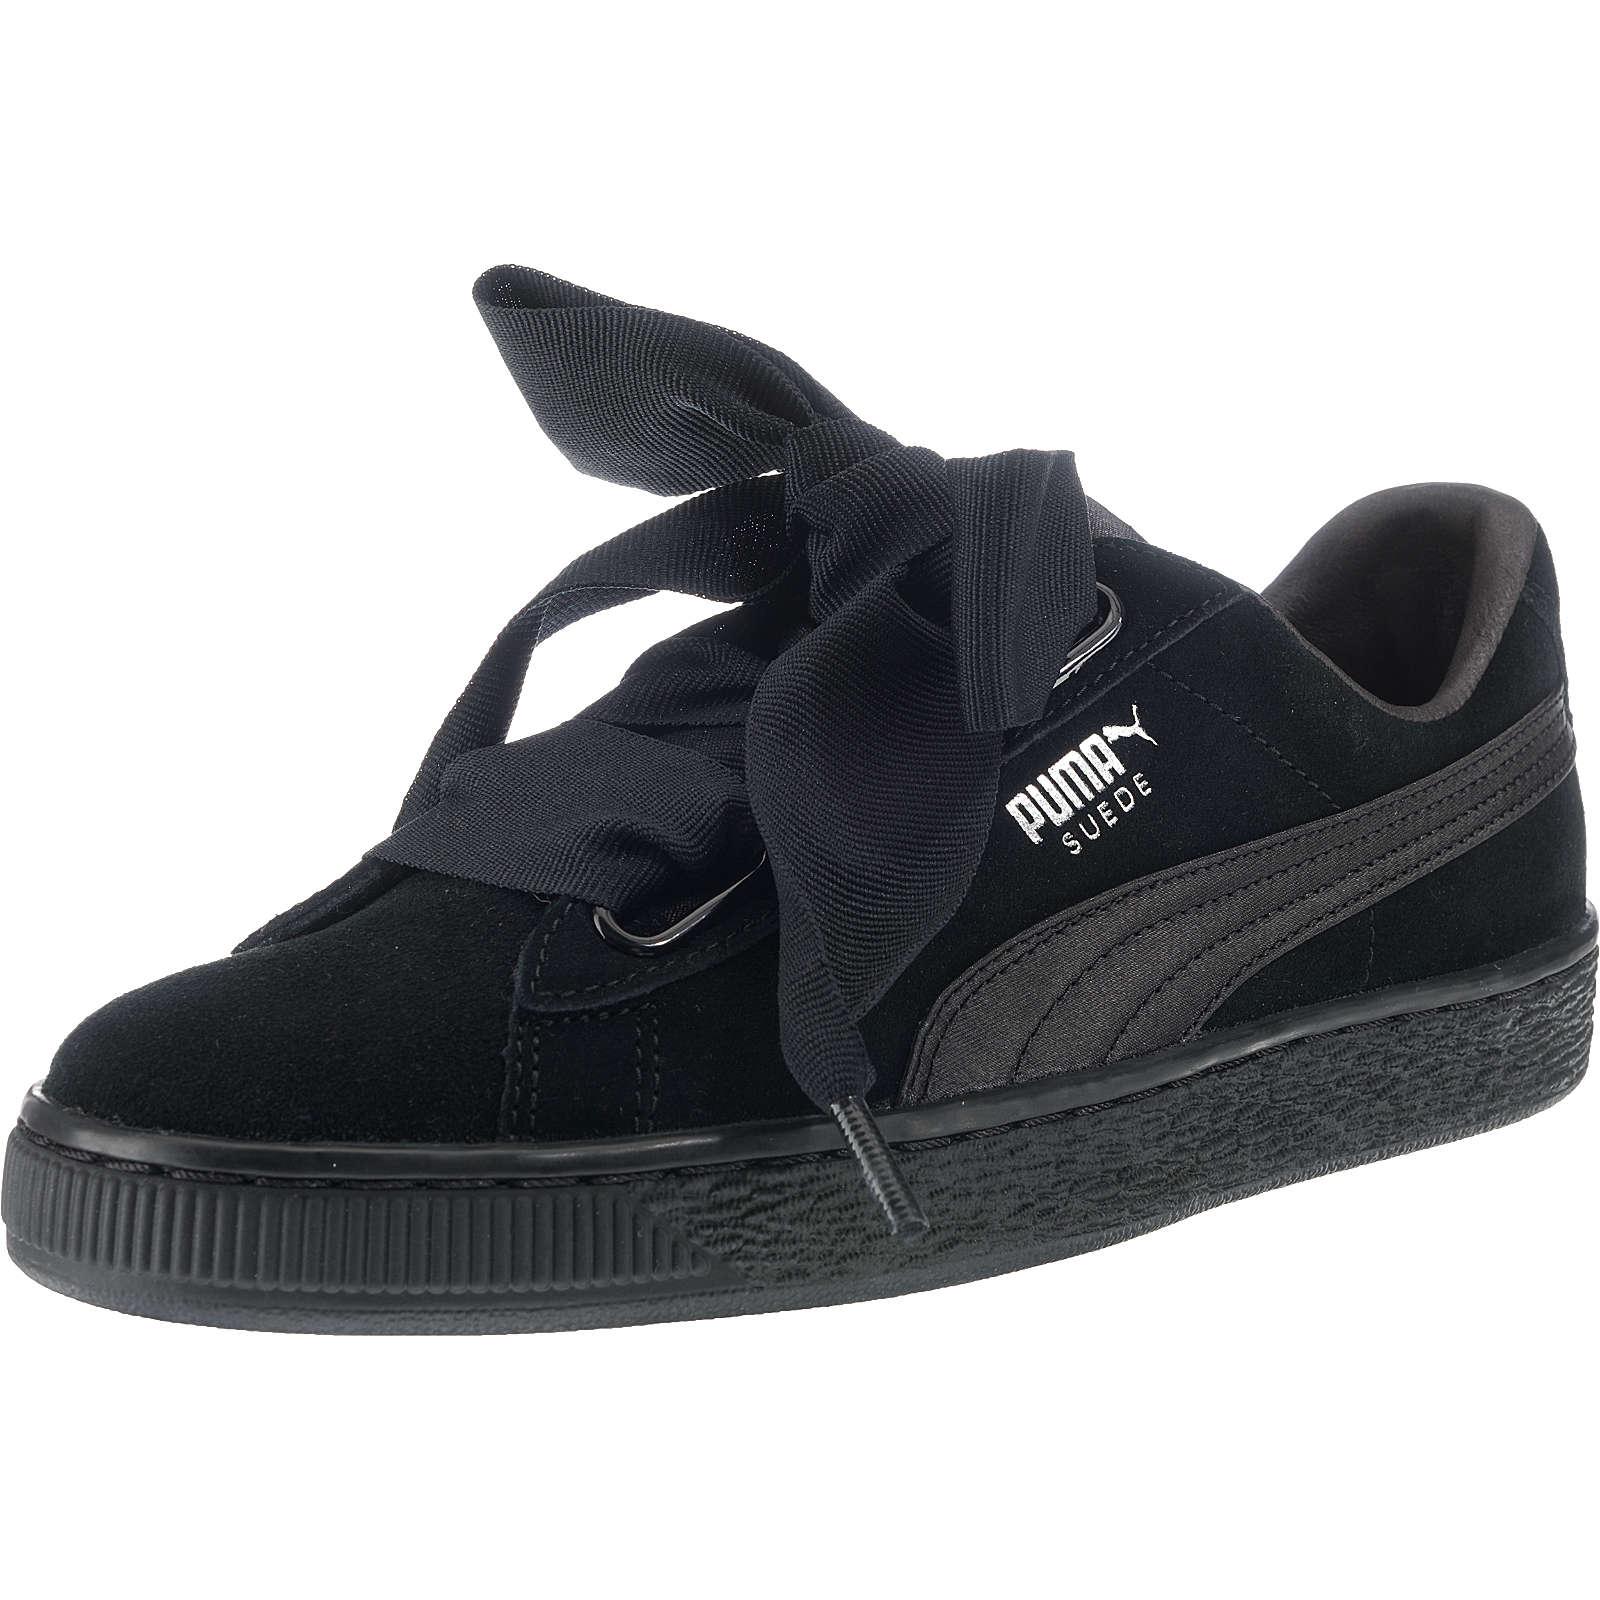 PUMA Suede Heart EP Sneakers schwarz Damen Gr. 39